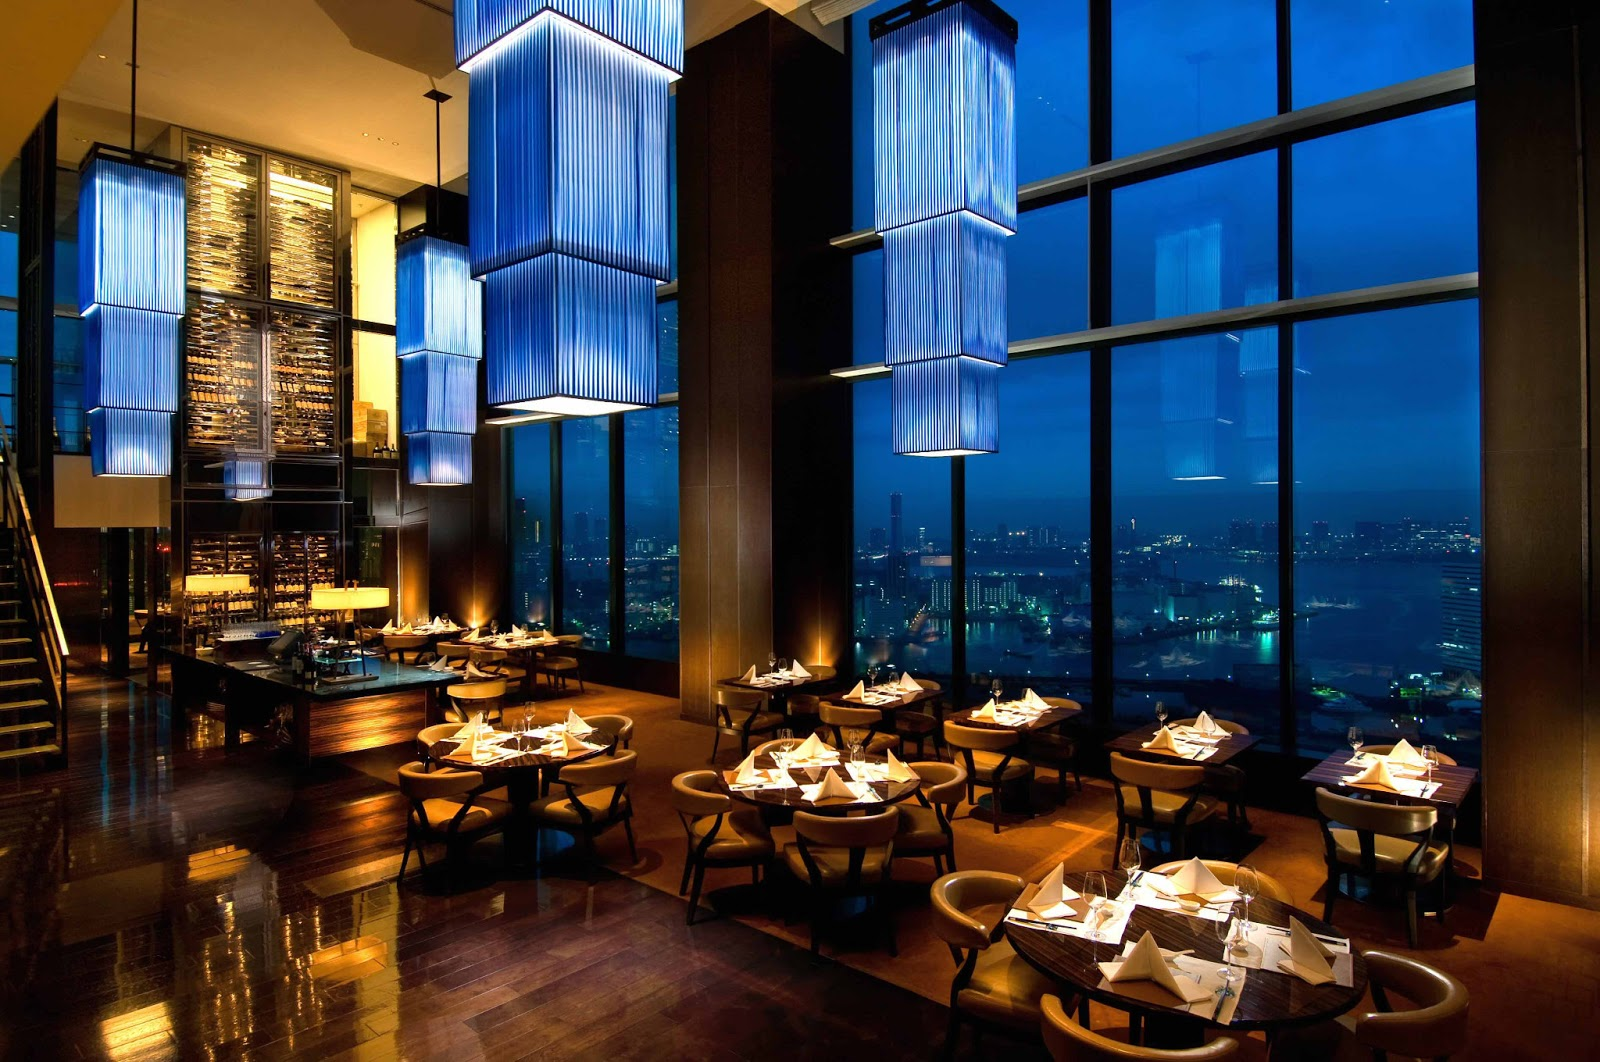 Conrad Hotel Chinese Restaurant